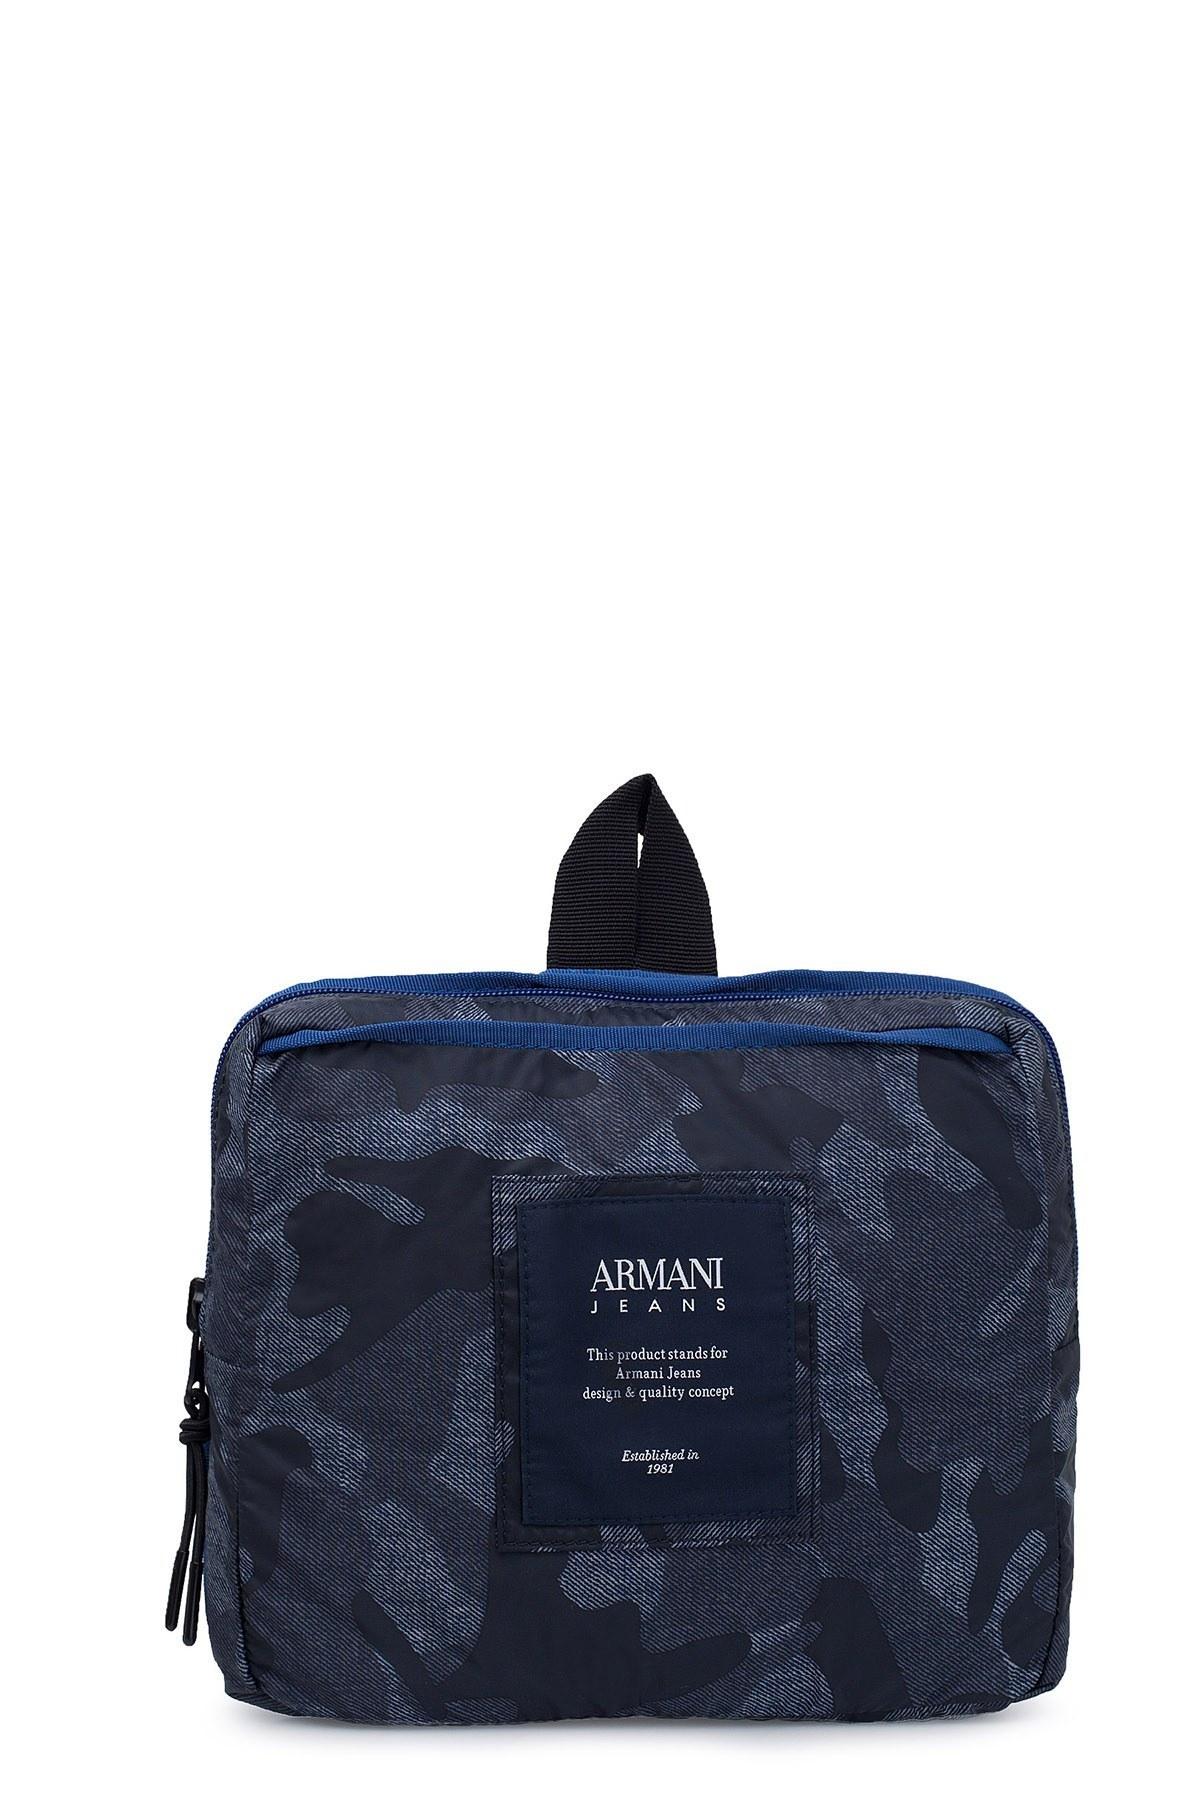 Armani Jeans Erkek Çanta 932063 7P924 40435 LACİVERT KAMUFLAJ